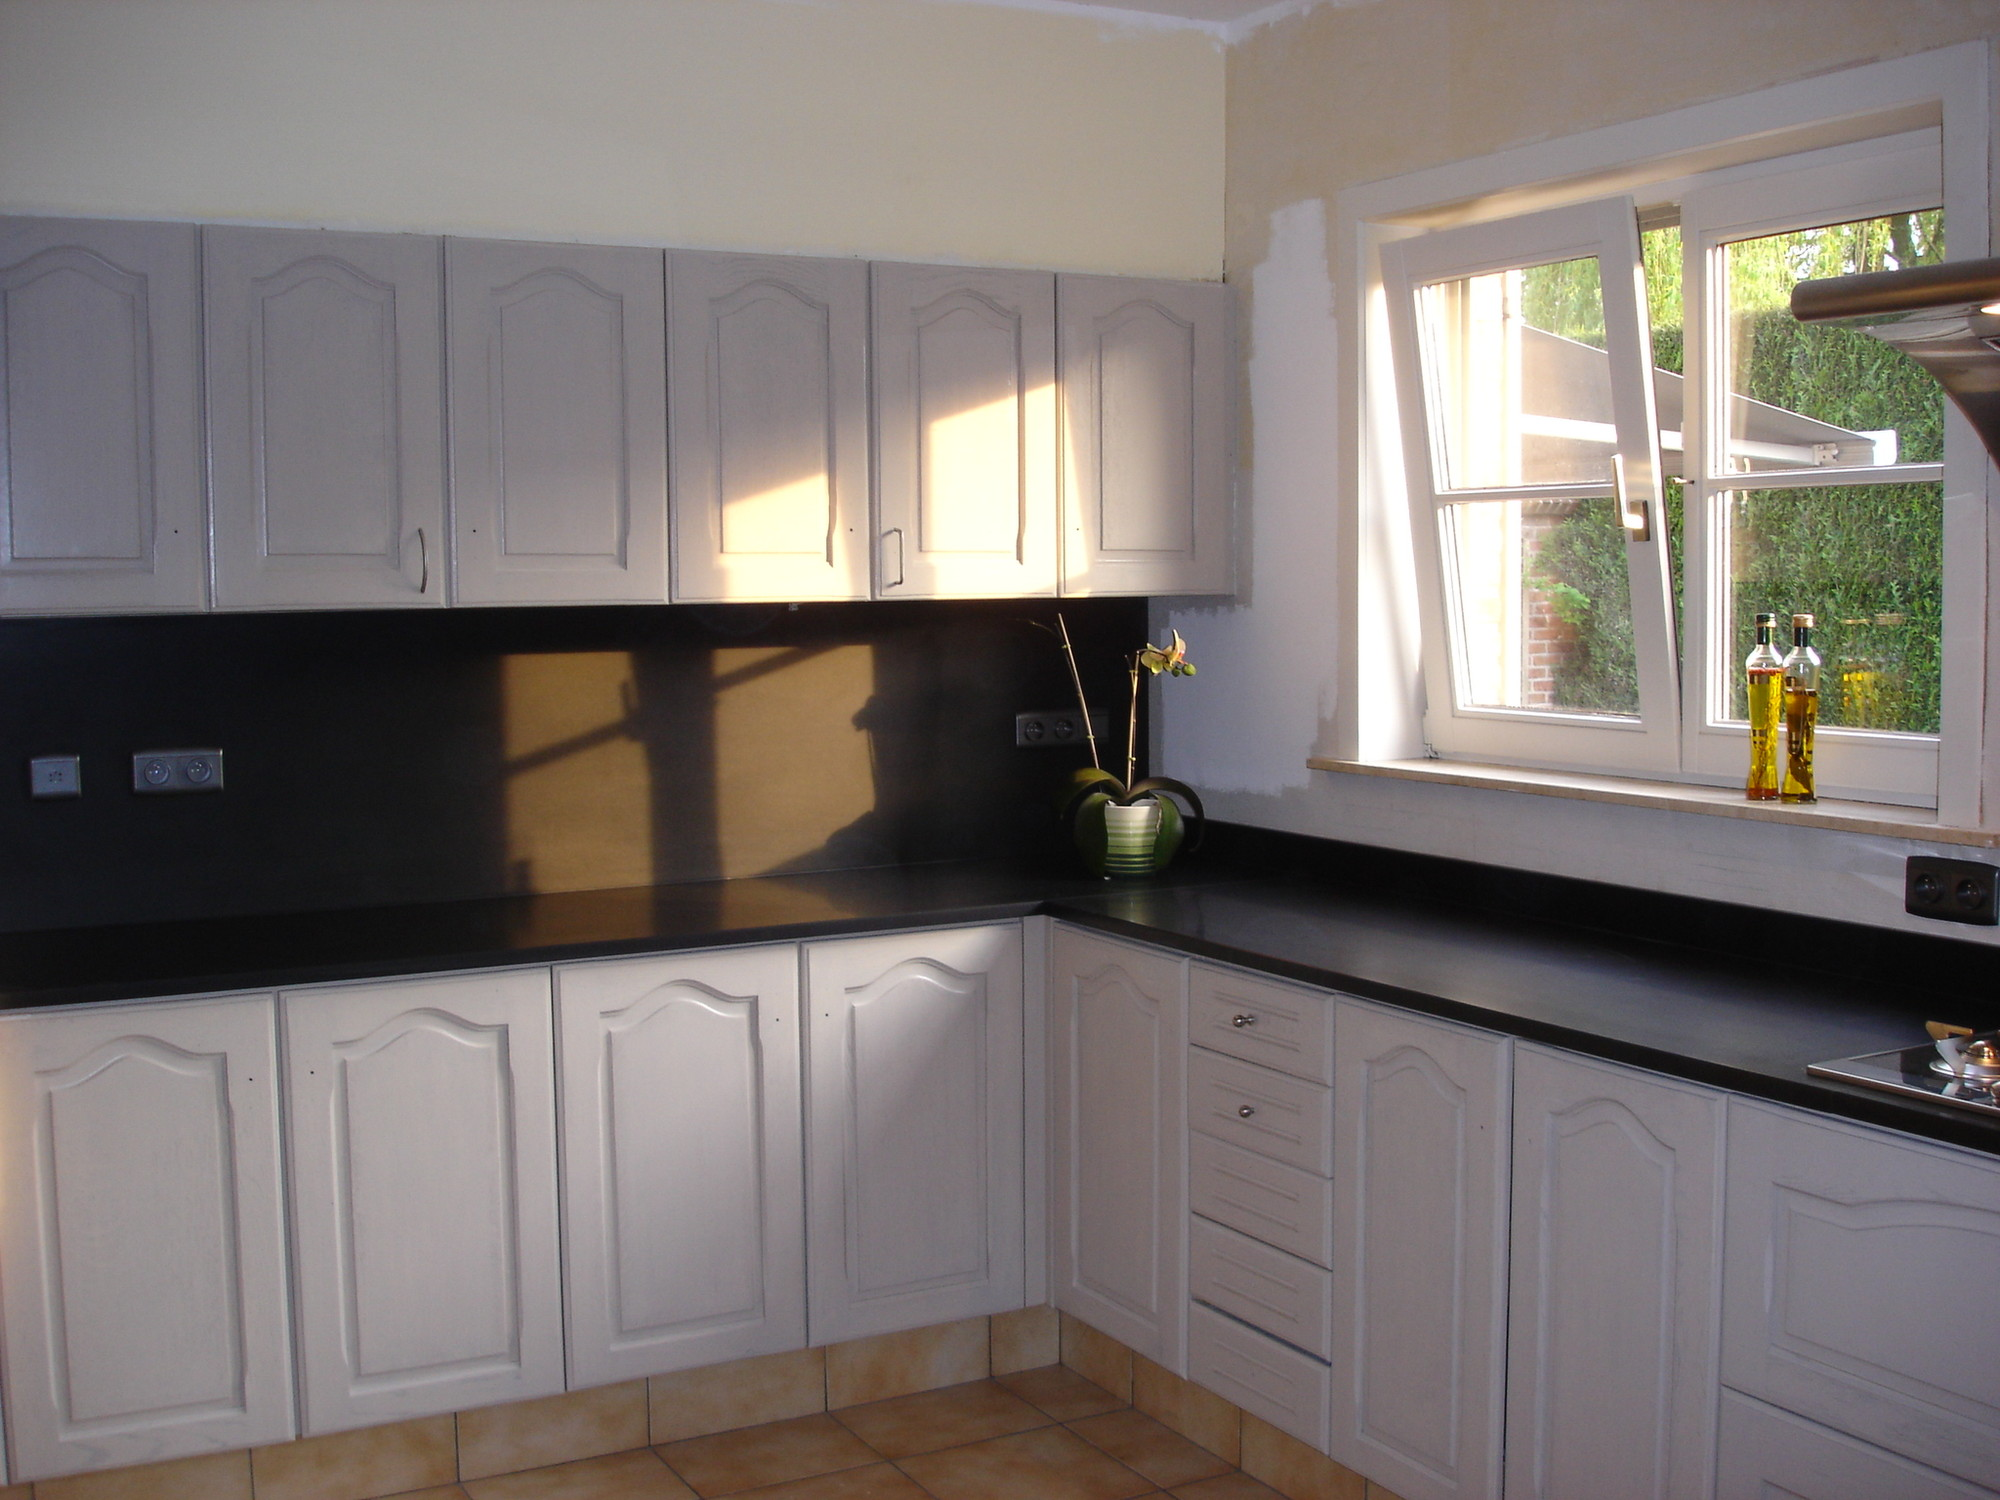 Eikenhouten Keuken Verven : Blog – Eikenhouten keukenkasten schilderen – colora.be